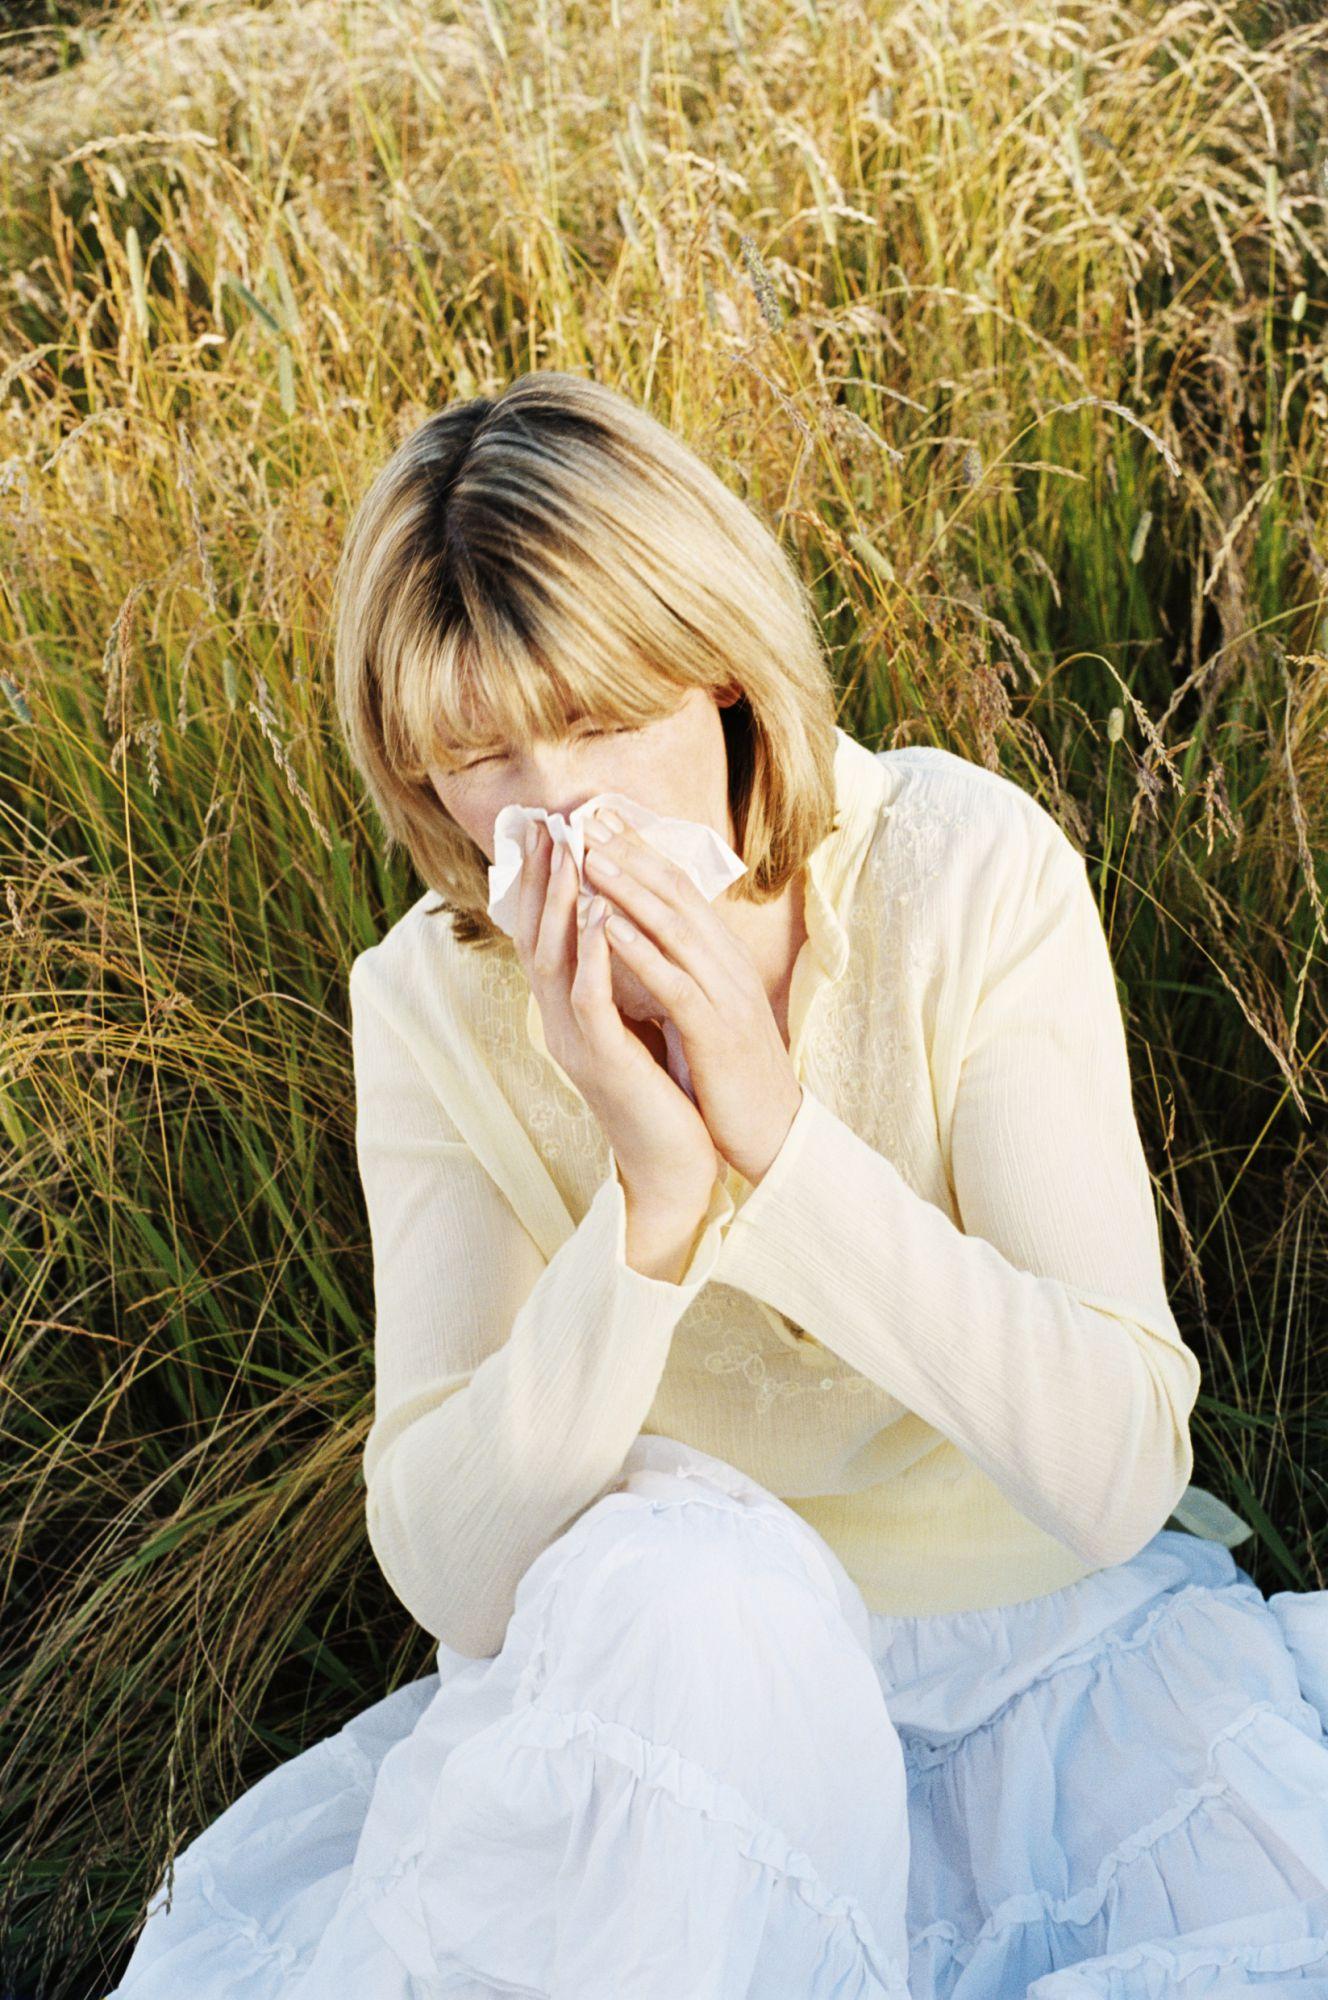 Histamine antagonists, medicines which combat allergies. © Phovoir